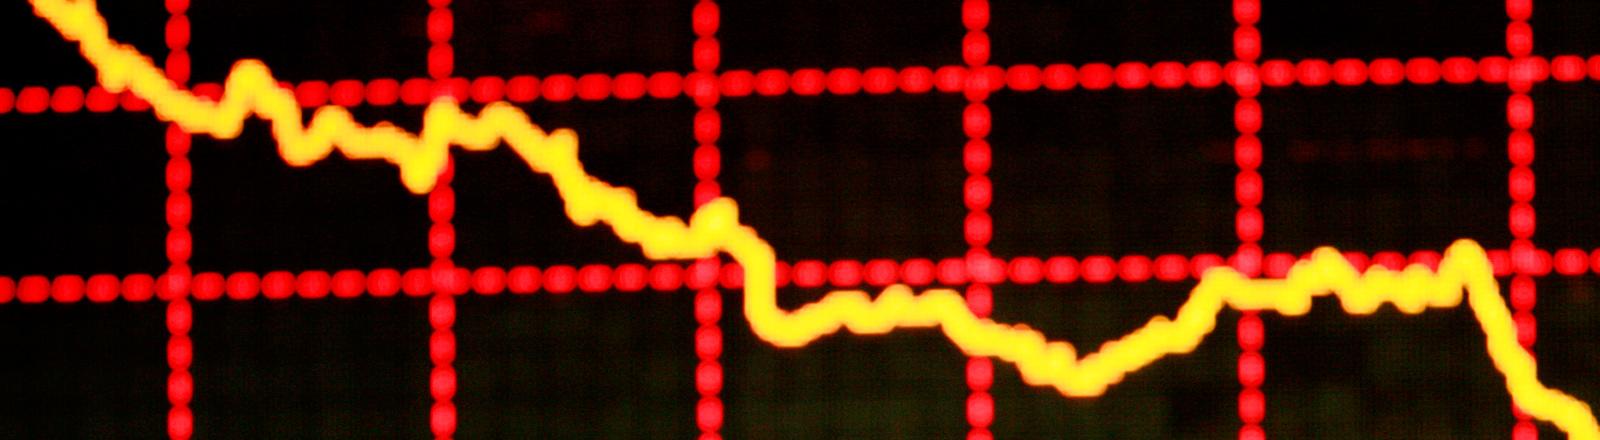 Ein fallender Börsenkurs